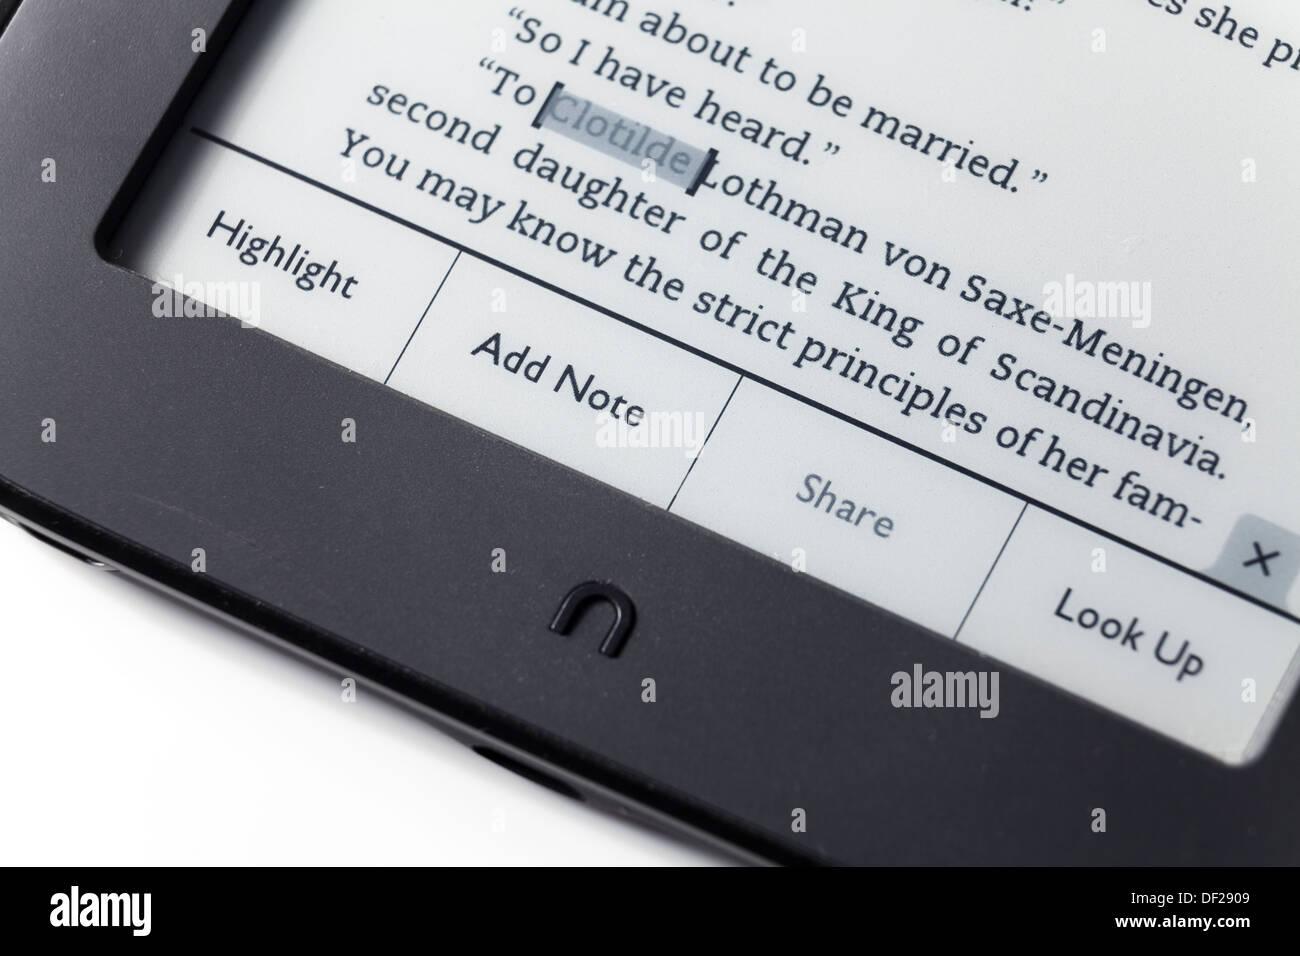 close up highlight add note menu on Nook EReader - Stock Image